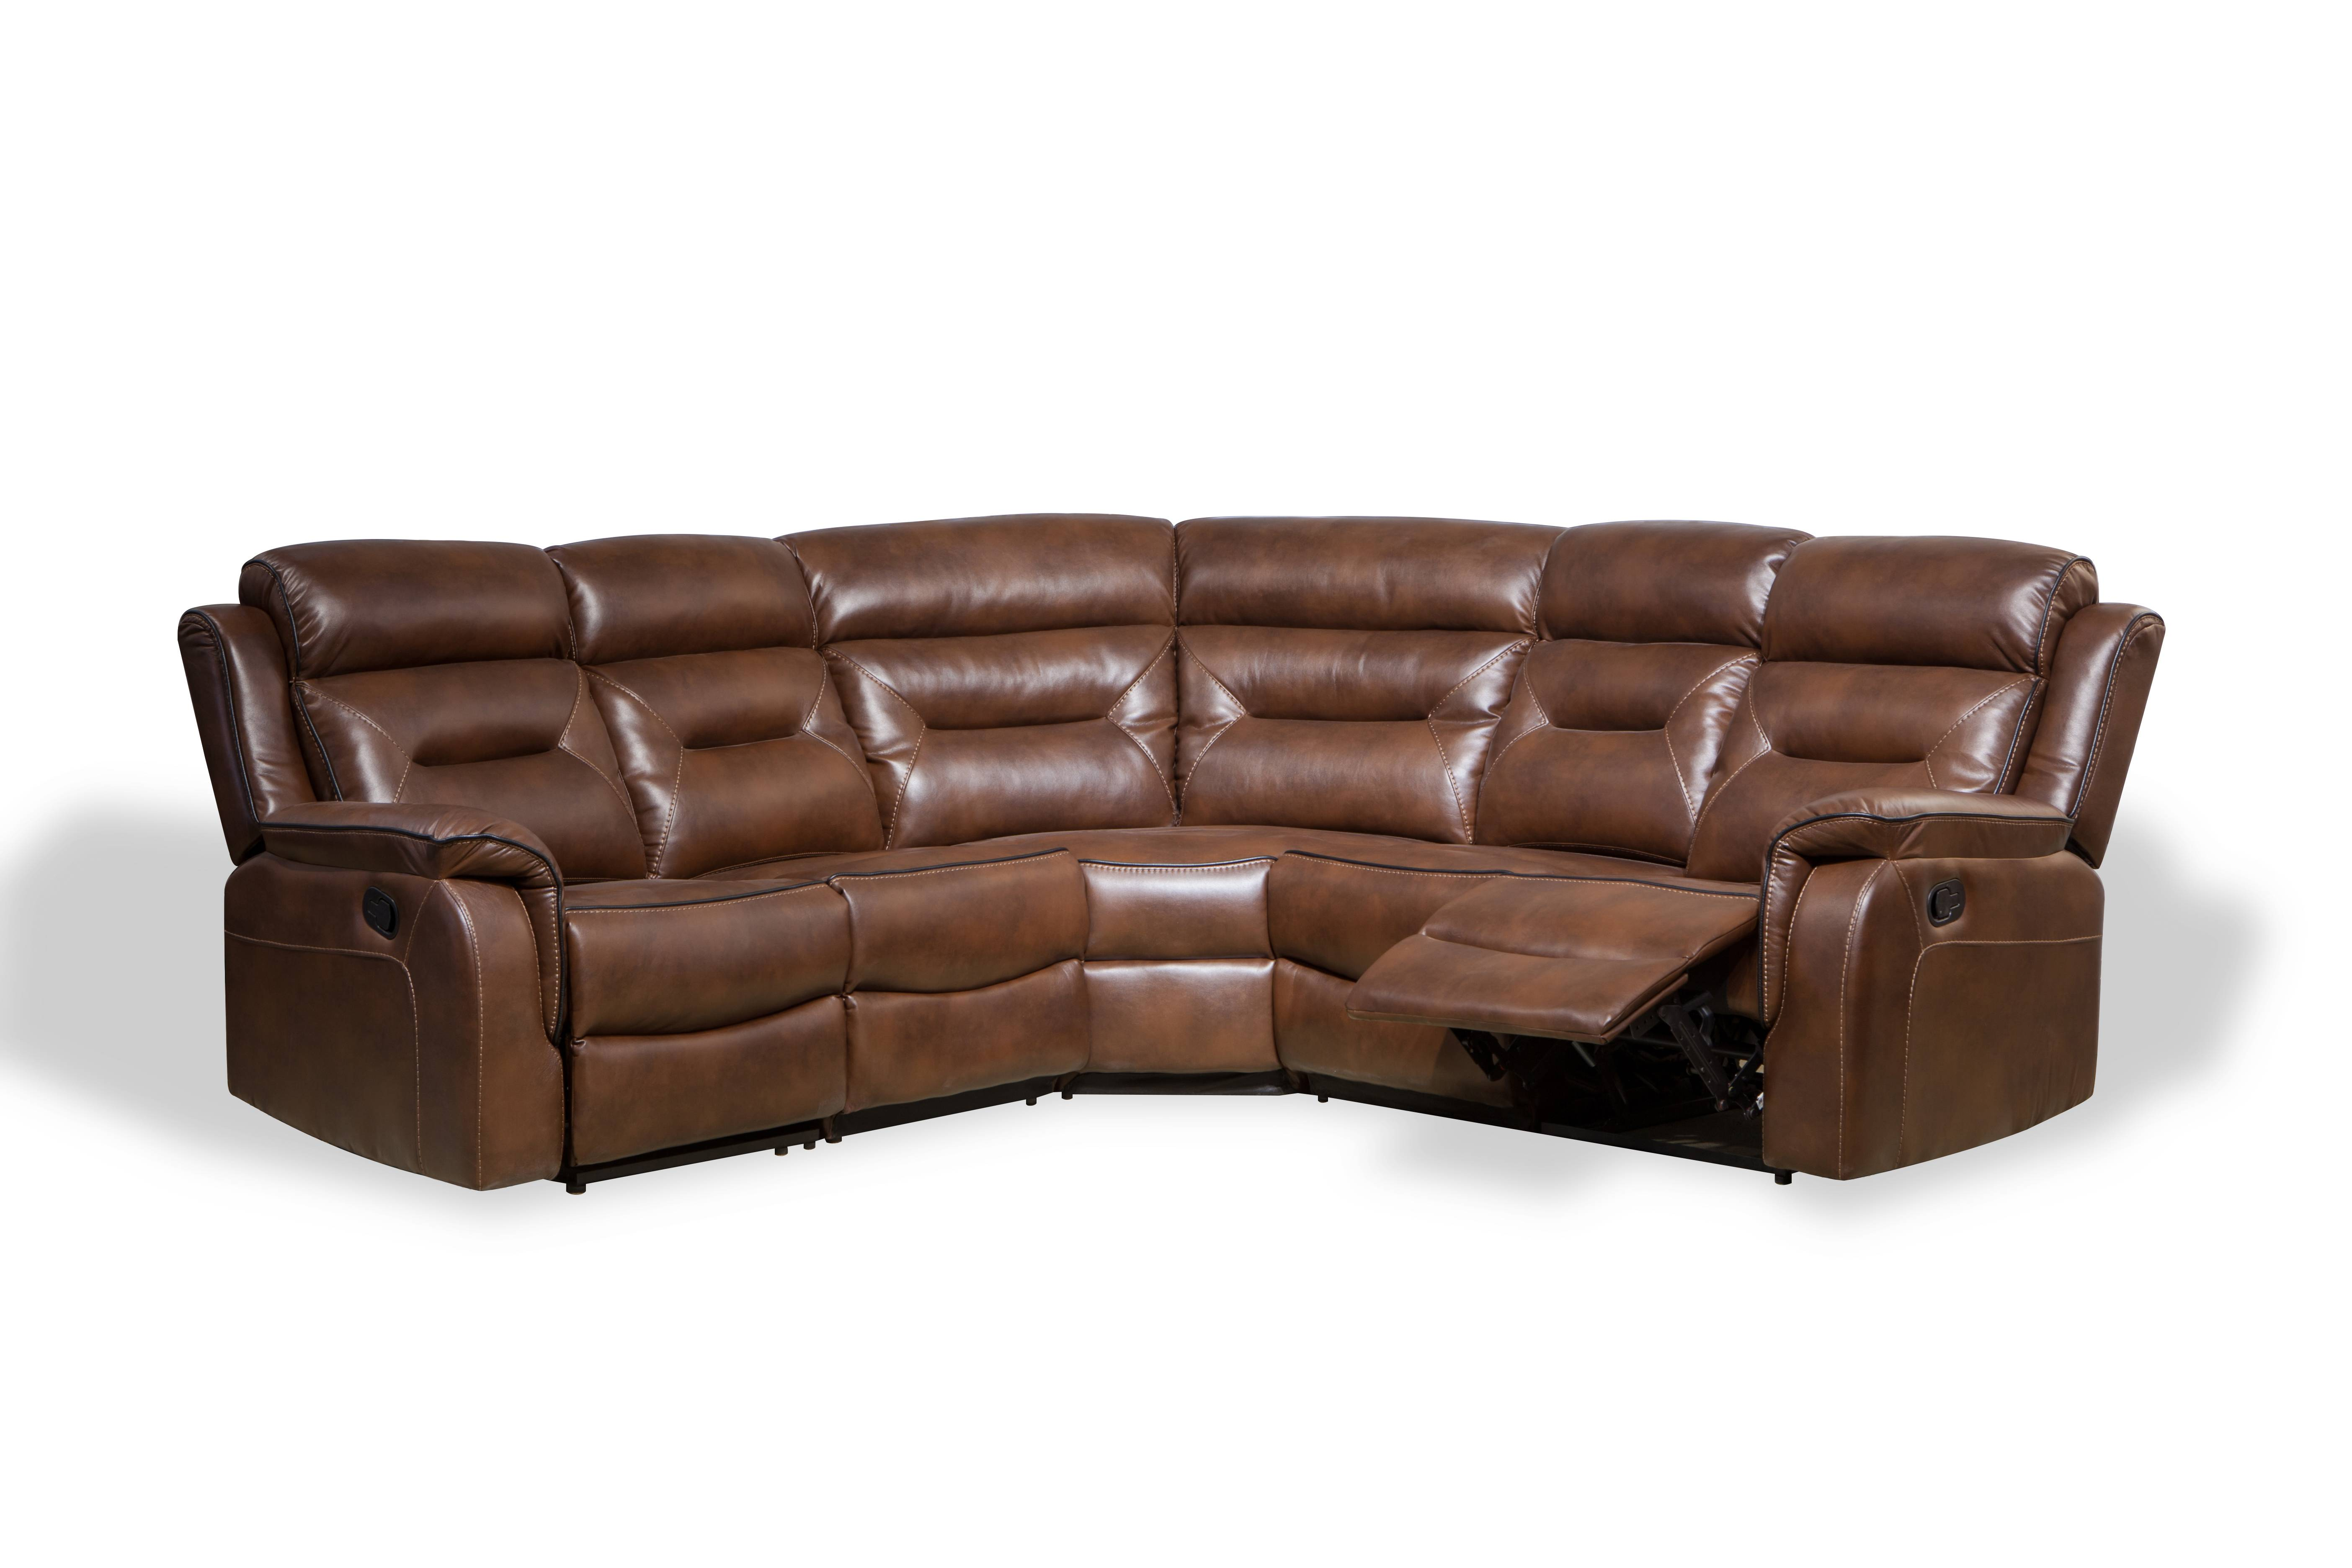 China Wholesale Price Leather Rocker Sofa - China suppliers